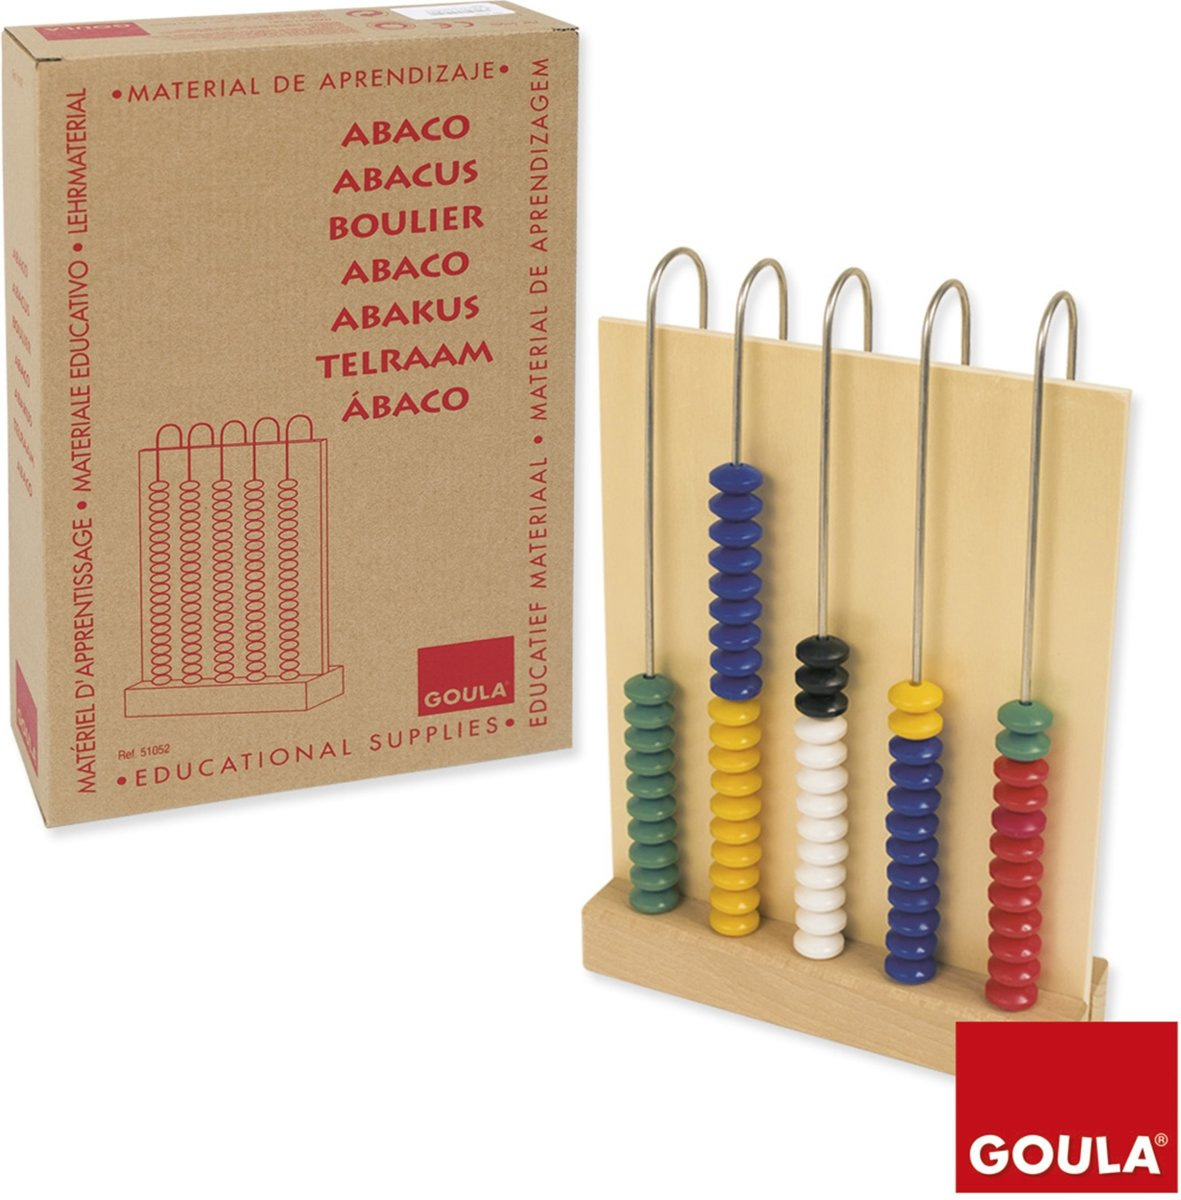 ABACO 5X20 MADEIRA GOULA * 51052